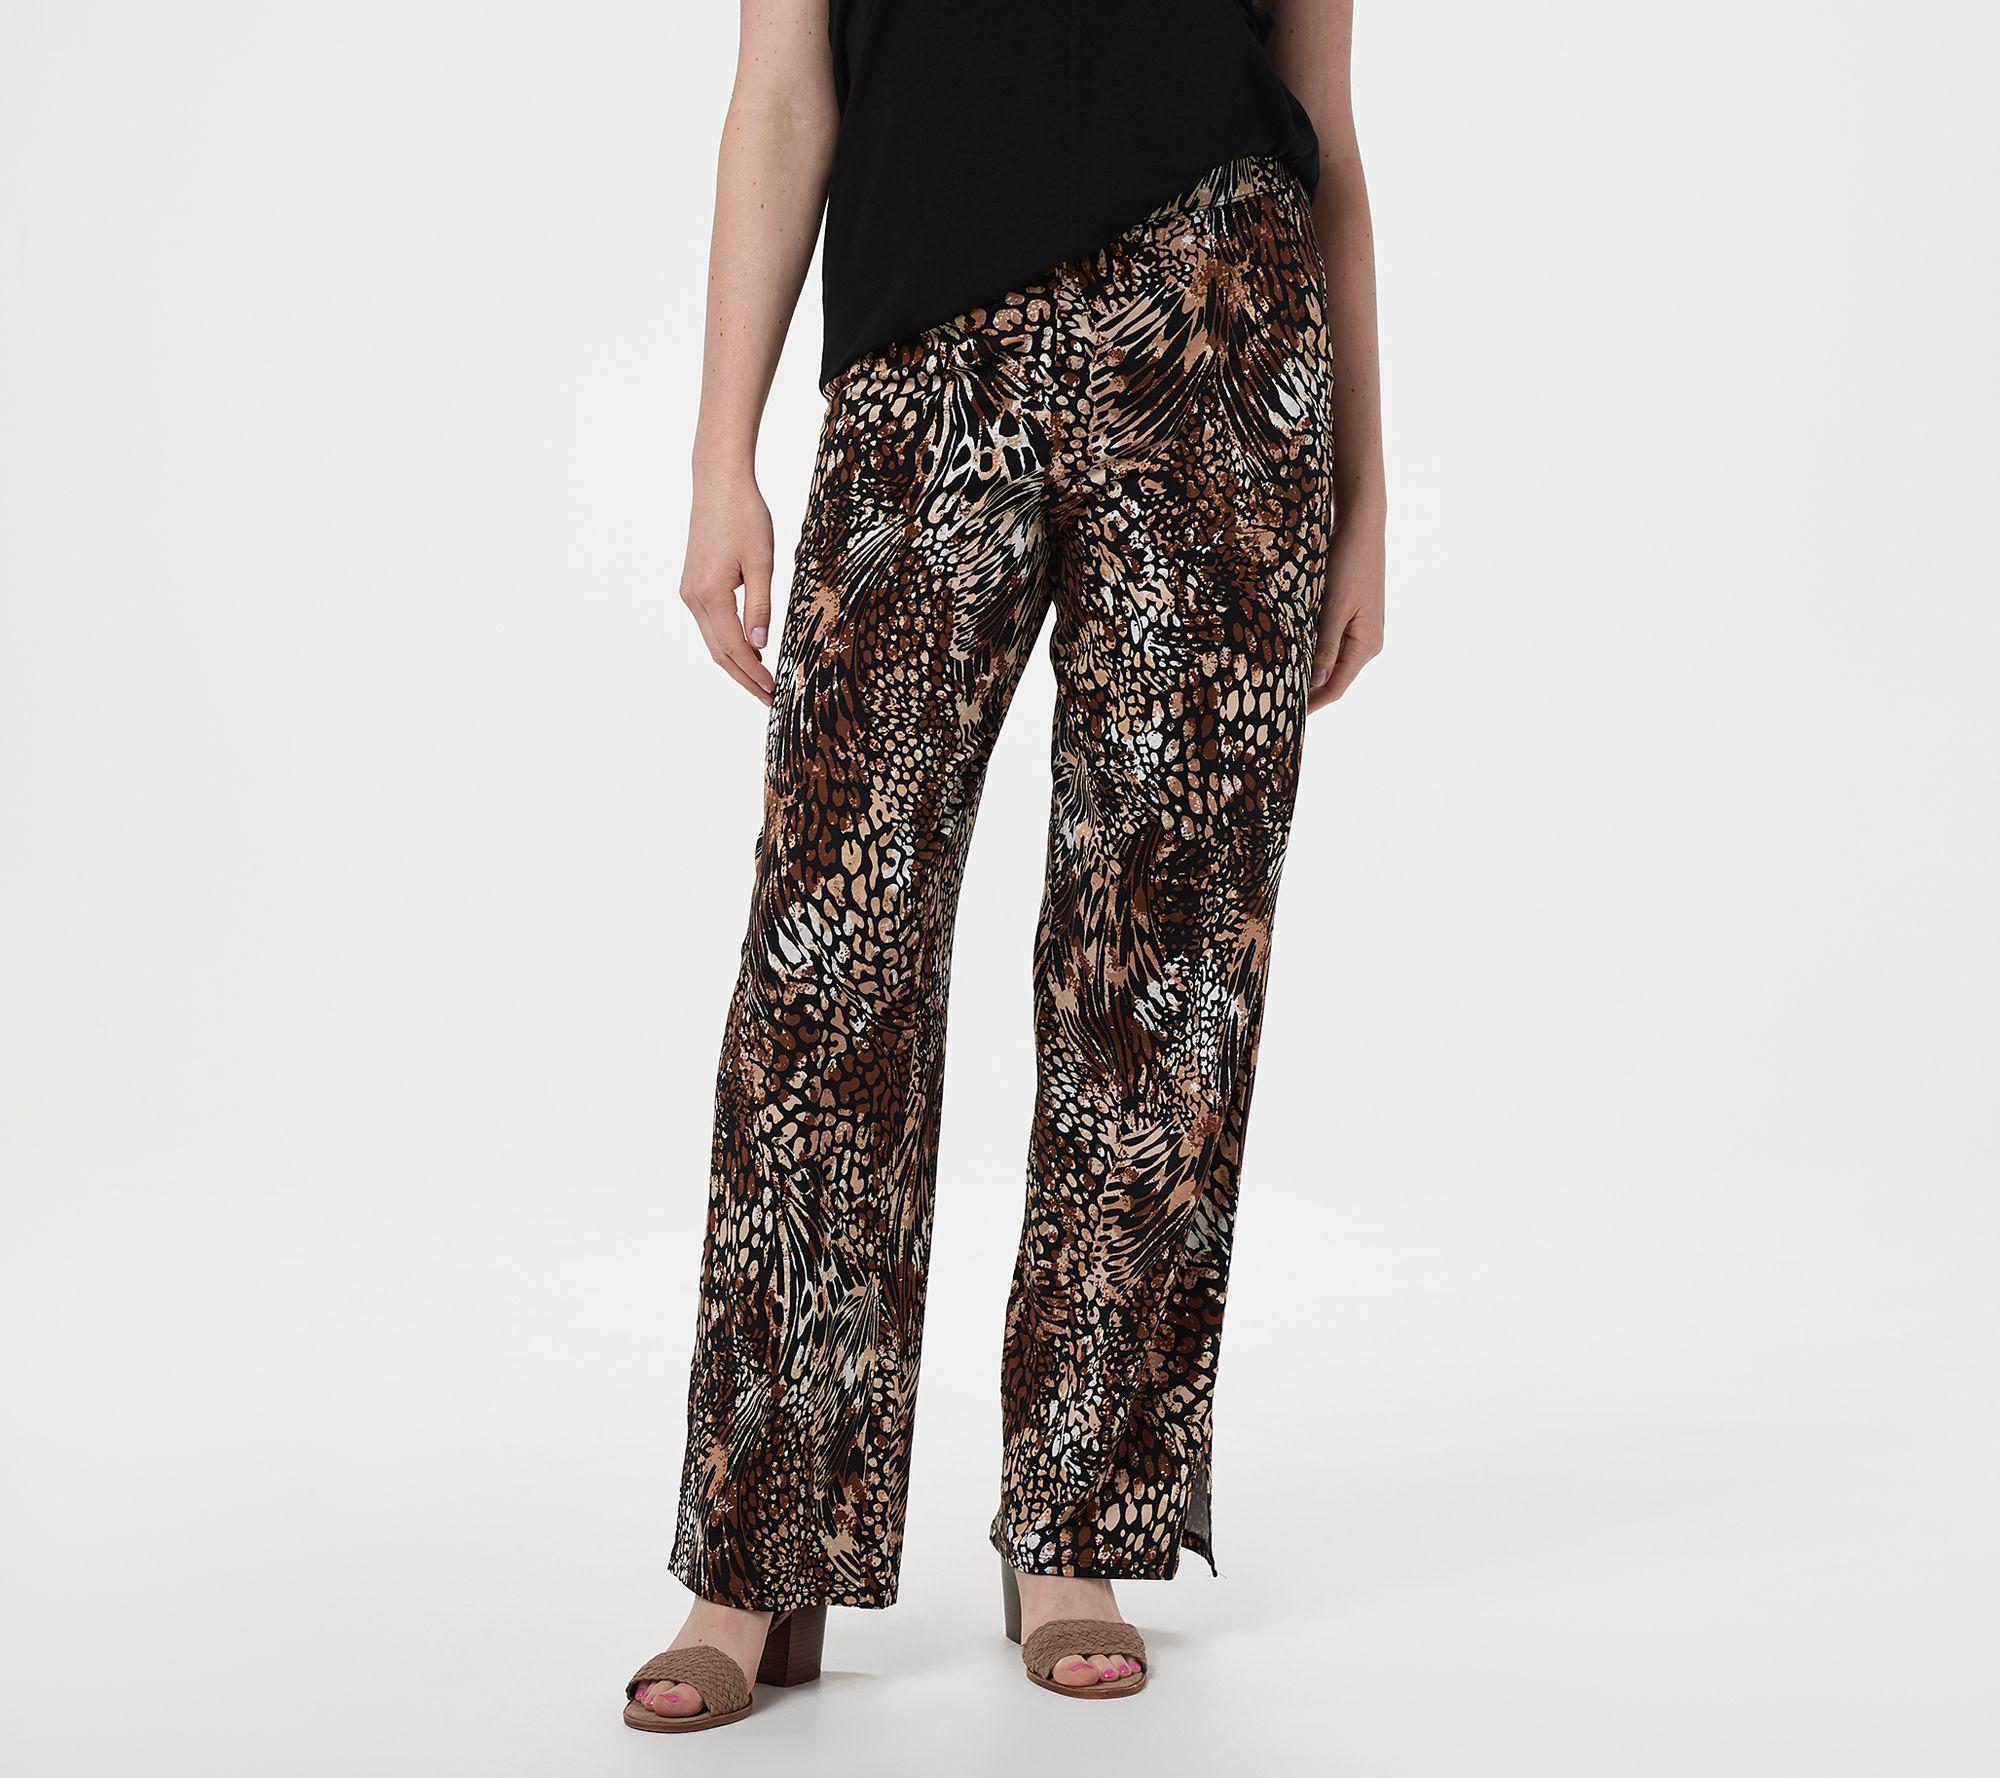 DressU Mens Cozy Floral Tribal Plus Size Leisure Breathable Hot Pants